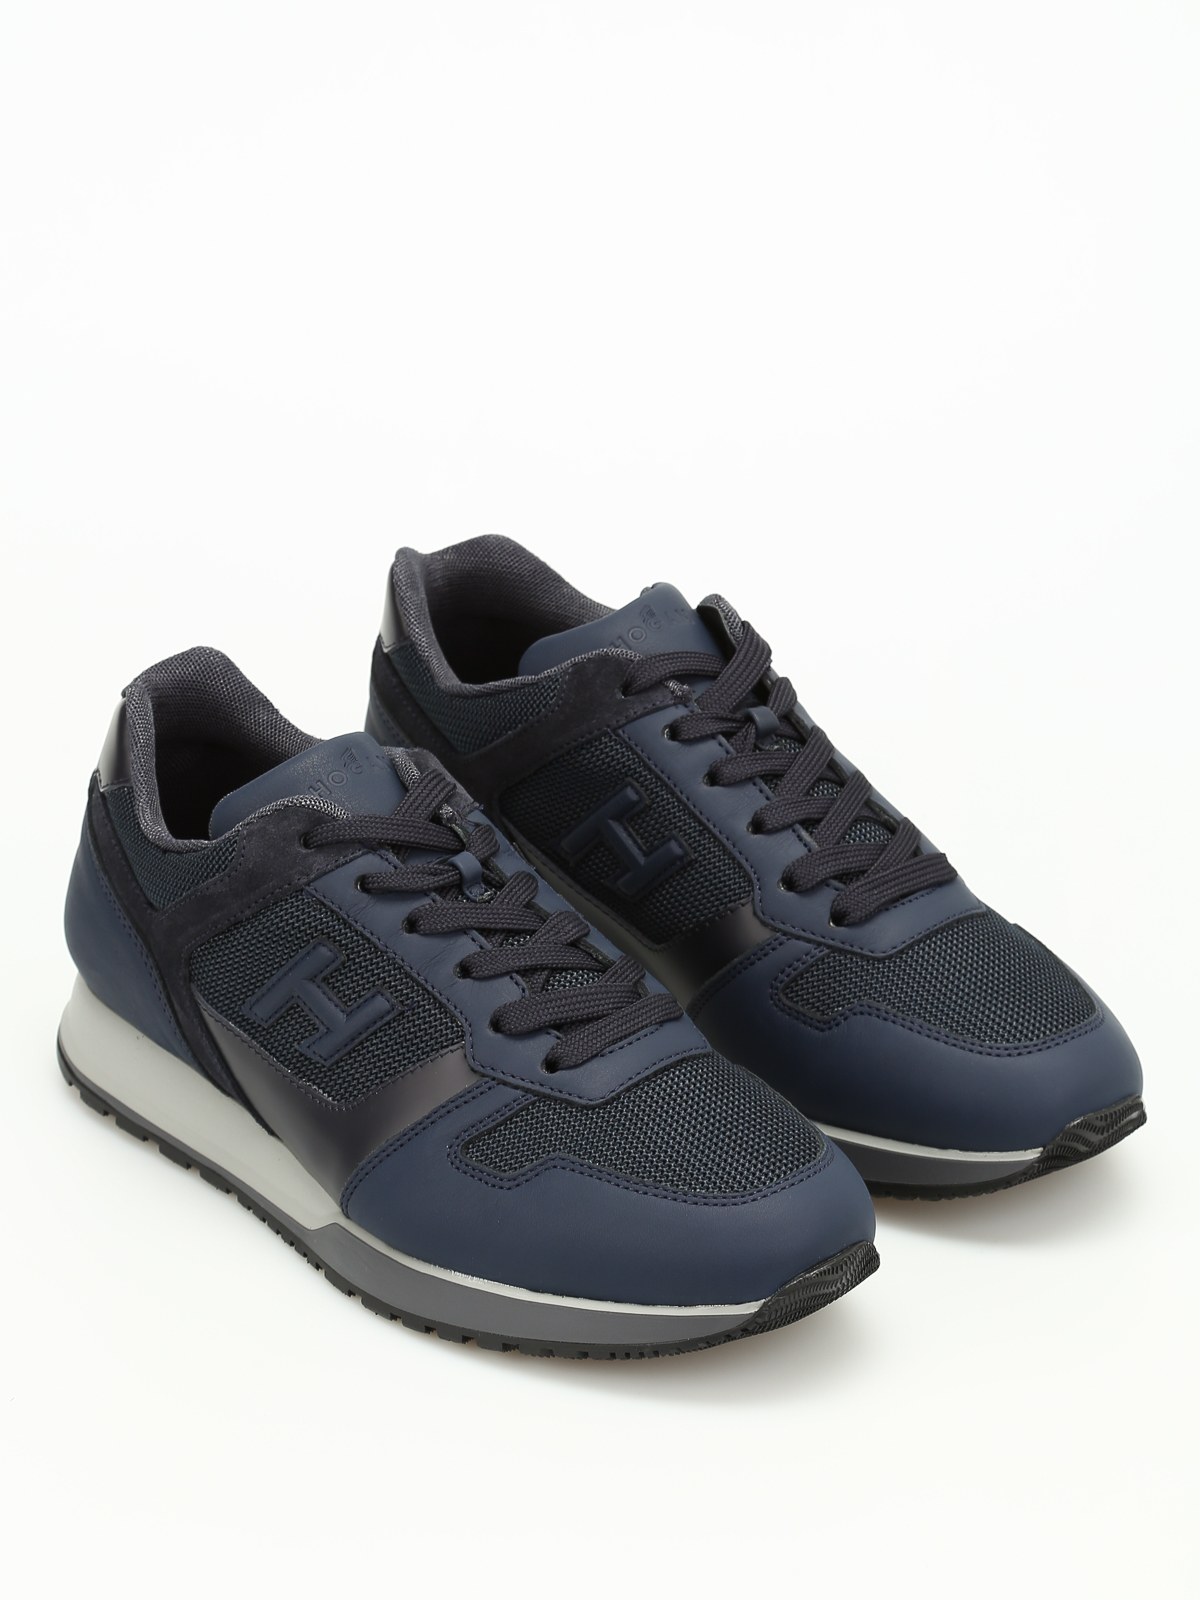 Trainers Hogan - H321 sneakers - HXM3210Y850HIF9AZC | Shop online ...